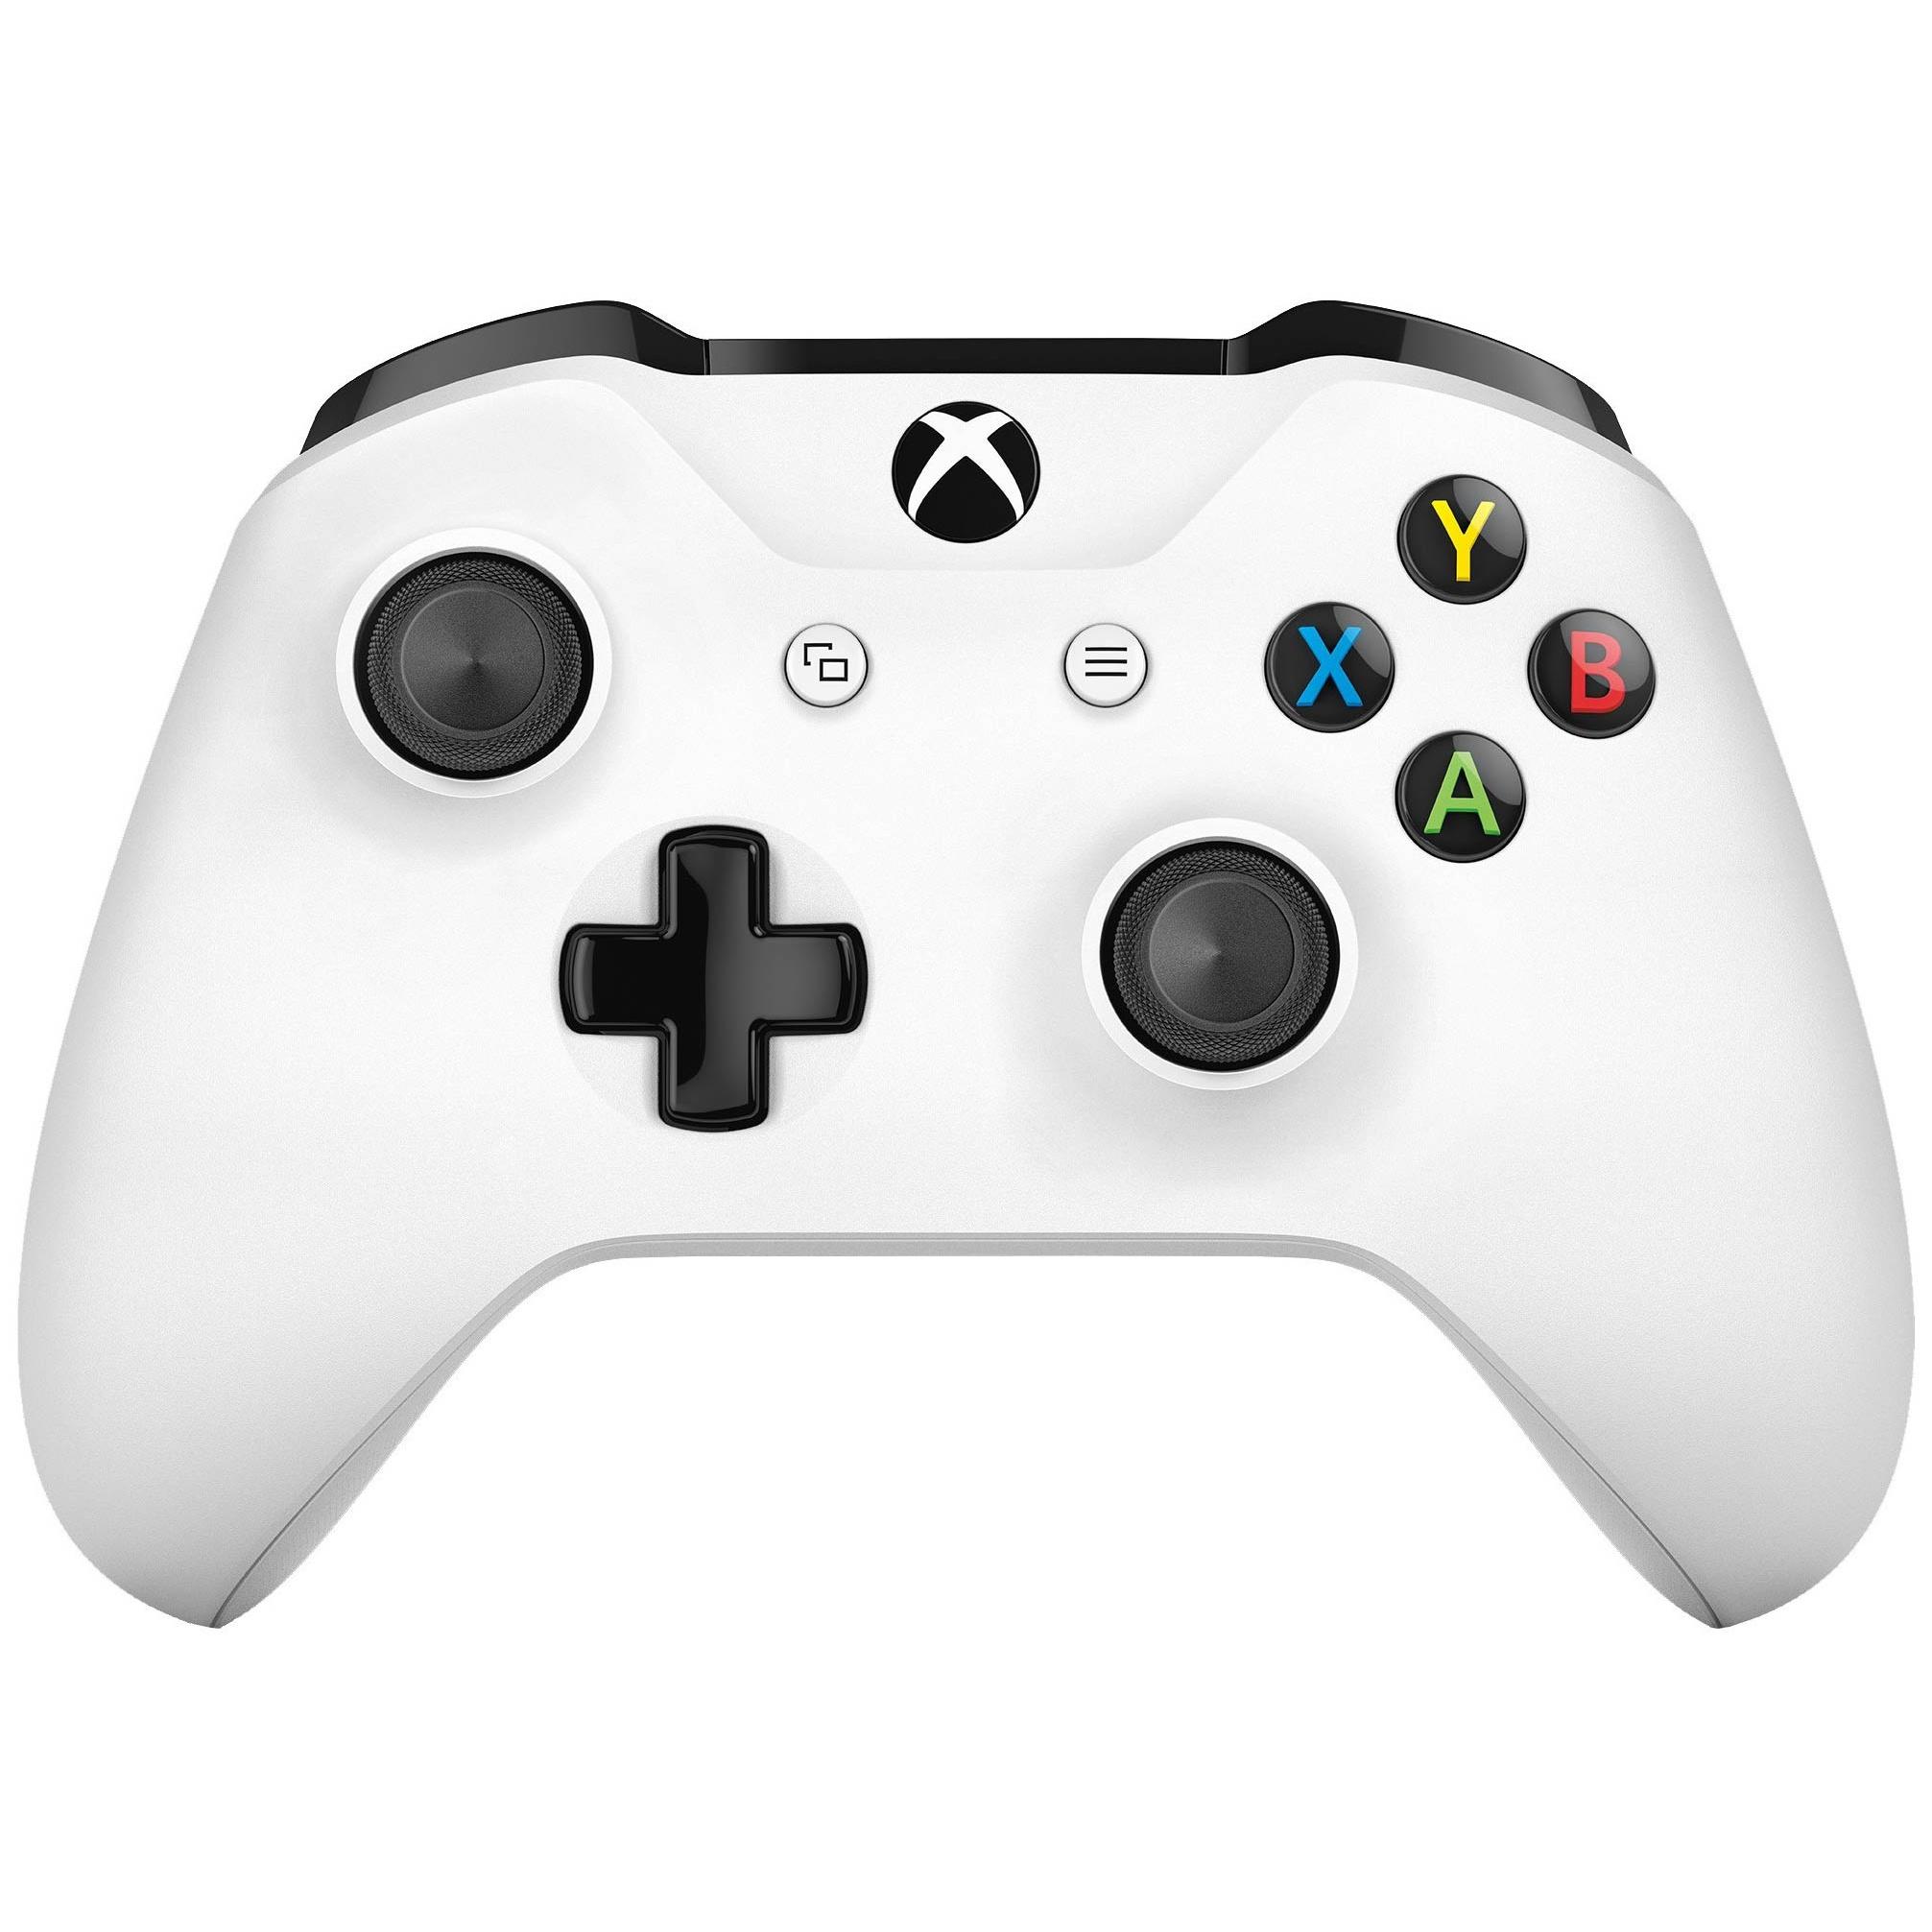 Геймпад Microsoft Xbox One TF5 00004 White